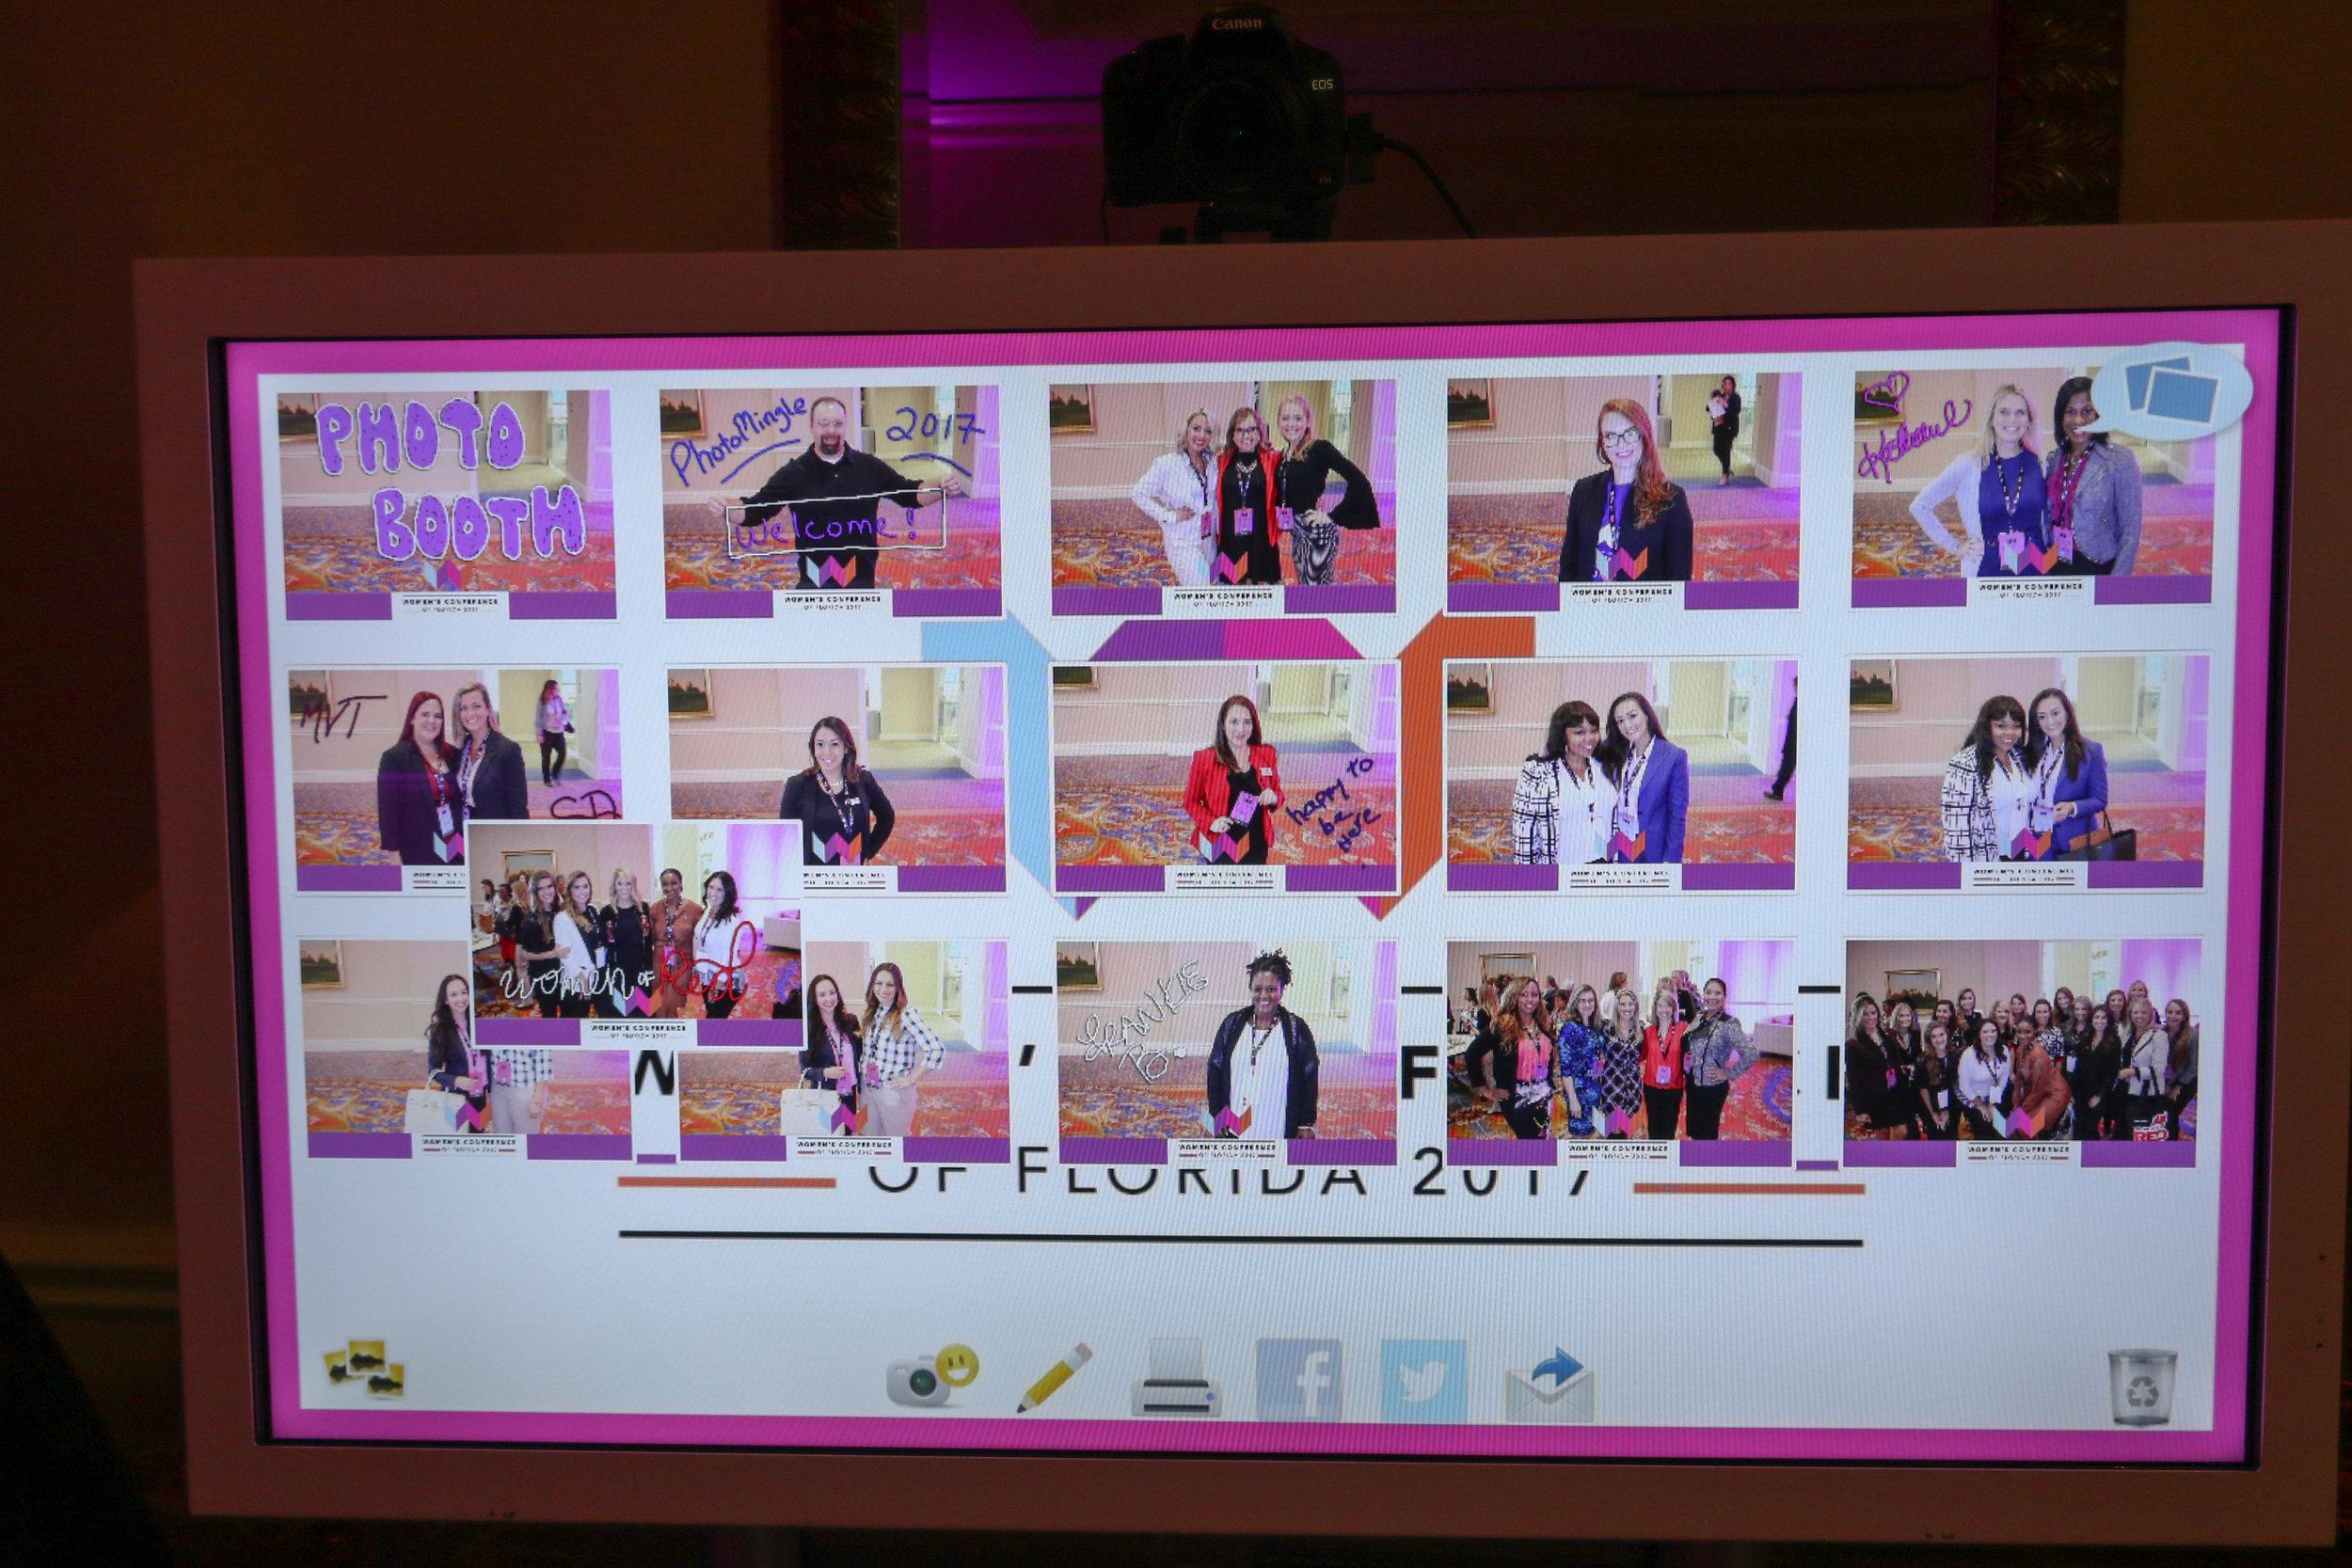 209_WomensConference_10-26-17.jpg